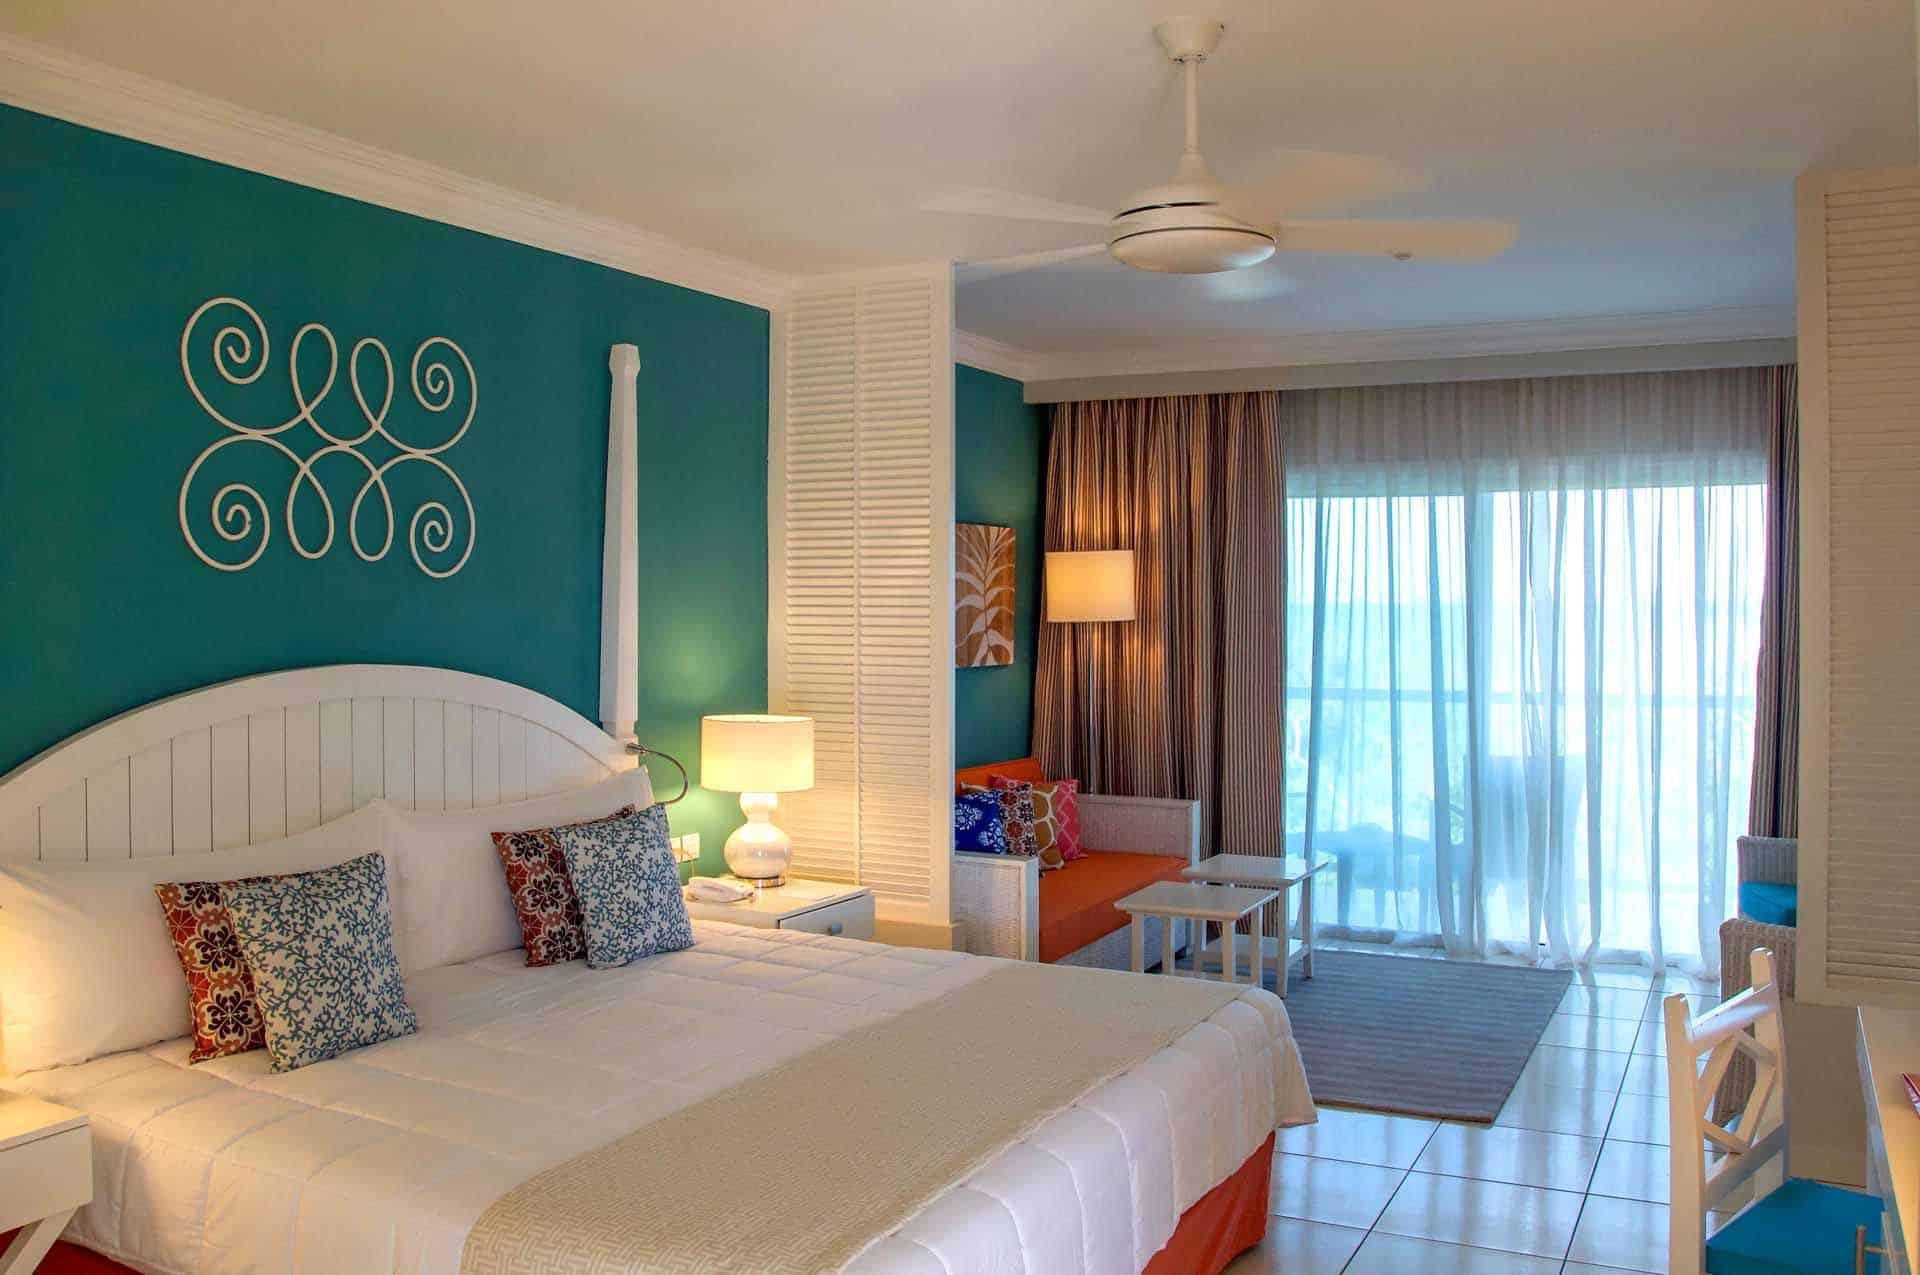 H4823 H4826 Hotel Angsana 05 cuba autrement